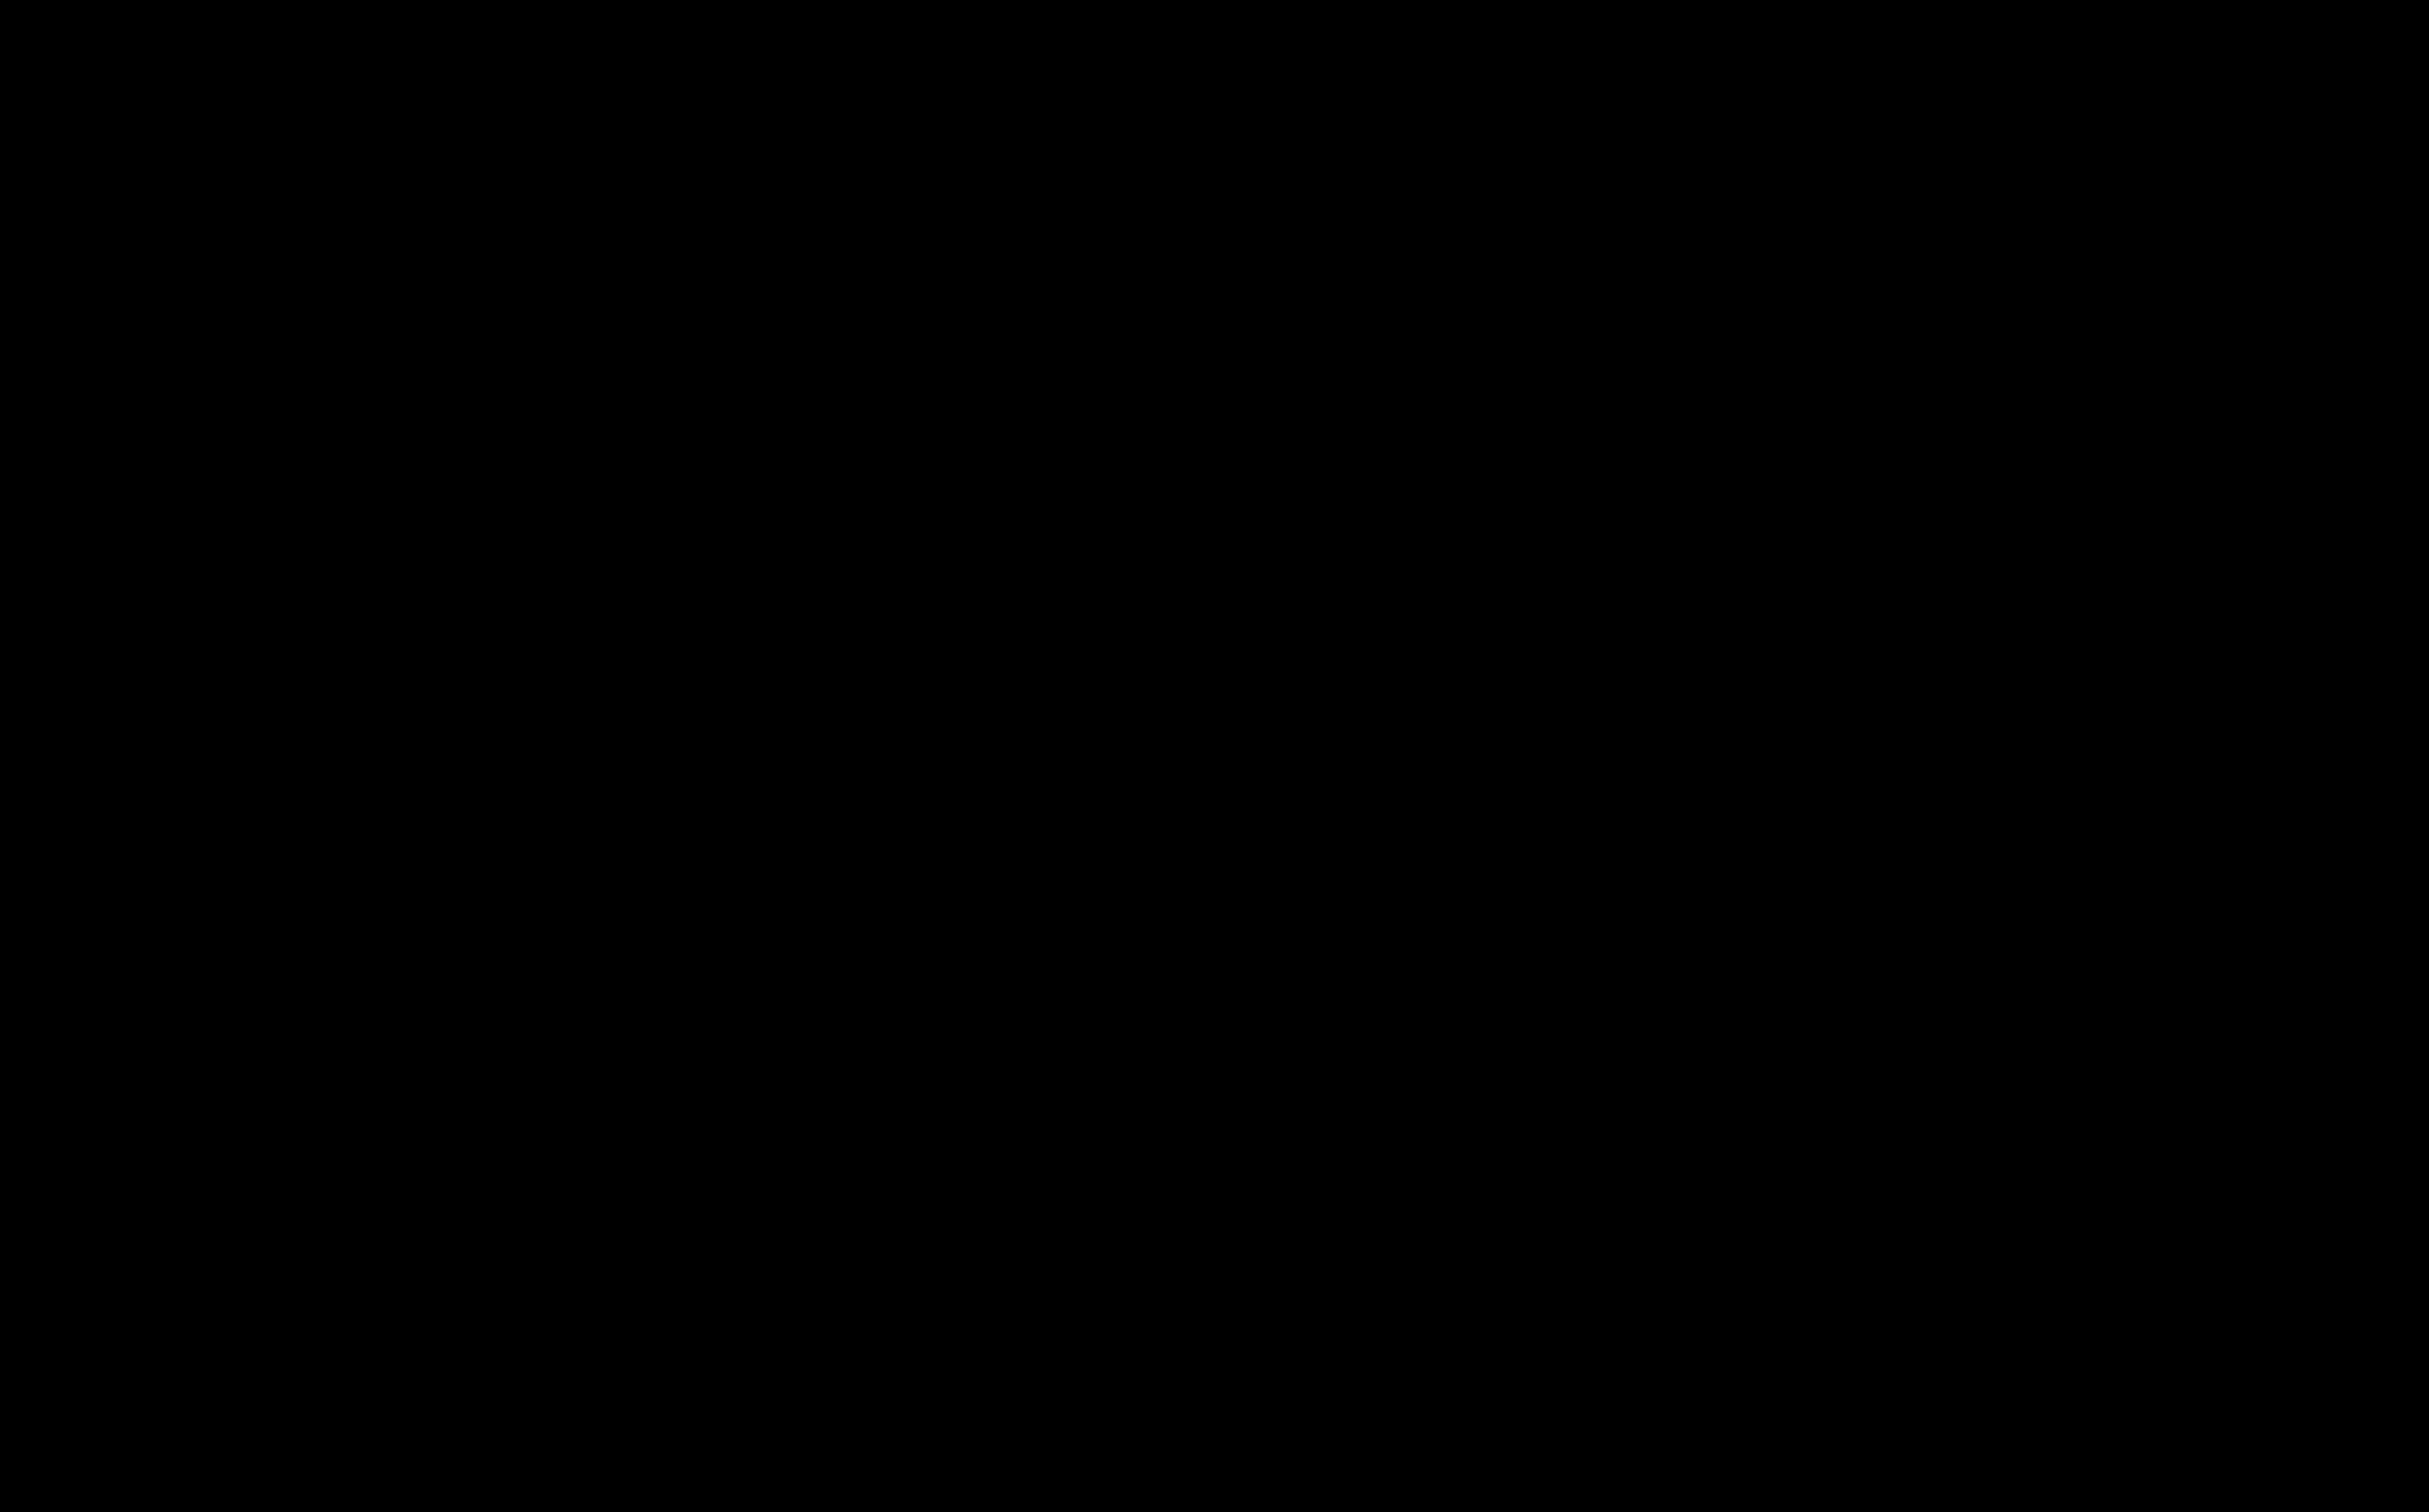 Jeppetto Reel 2015